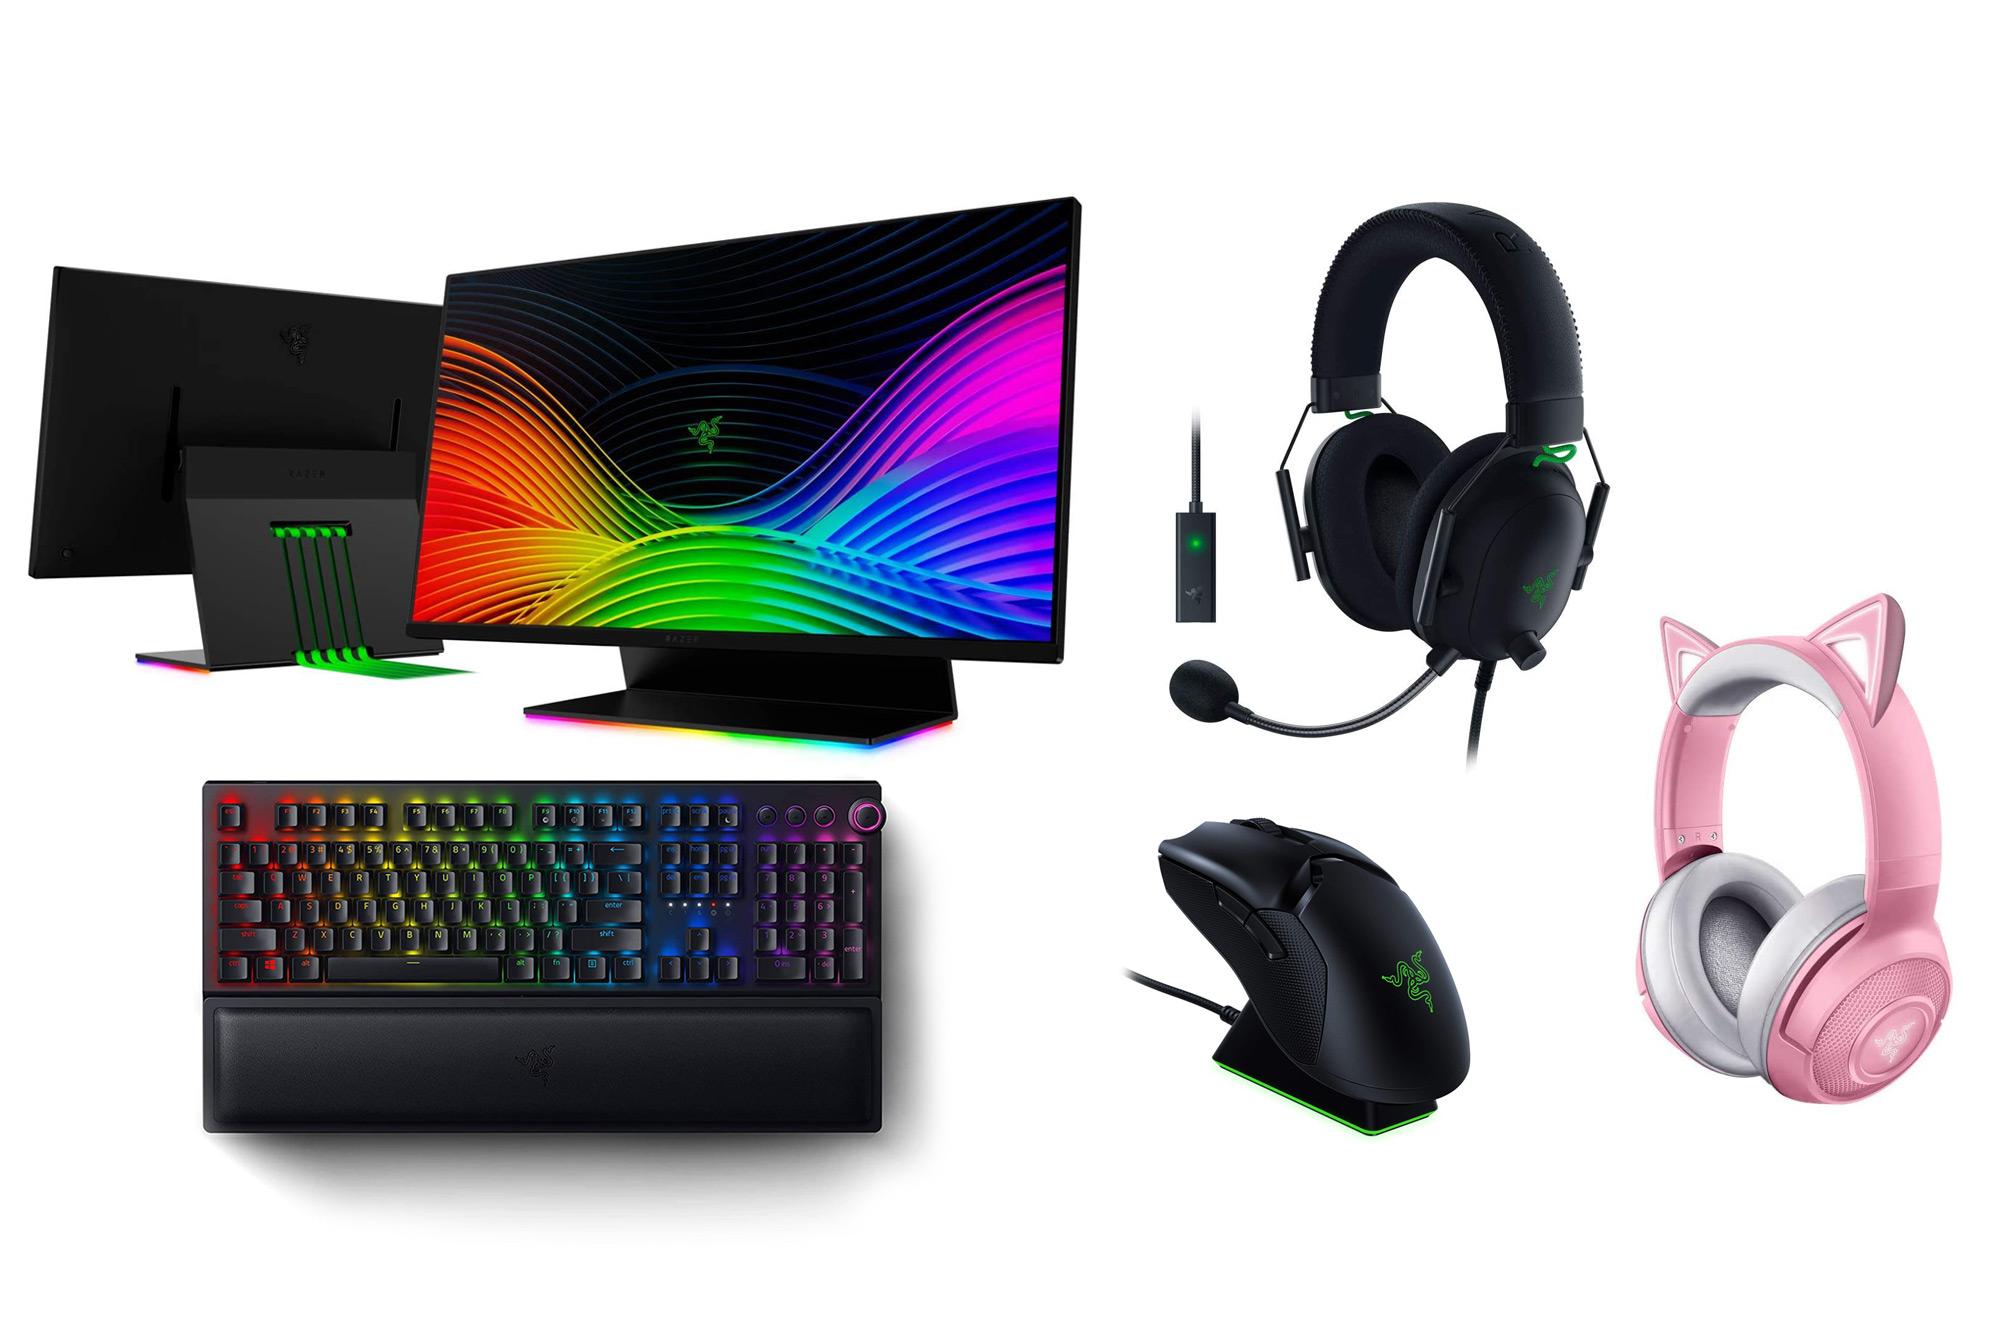 Amazon Prime Day Razer deals for gamers